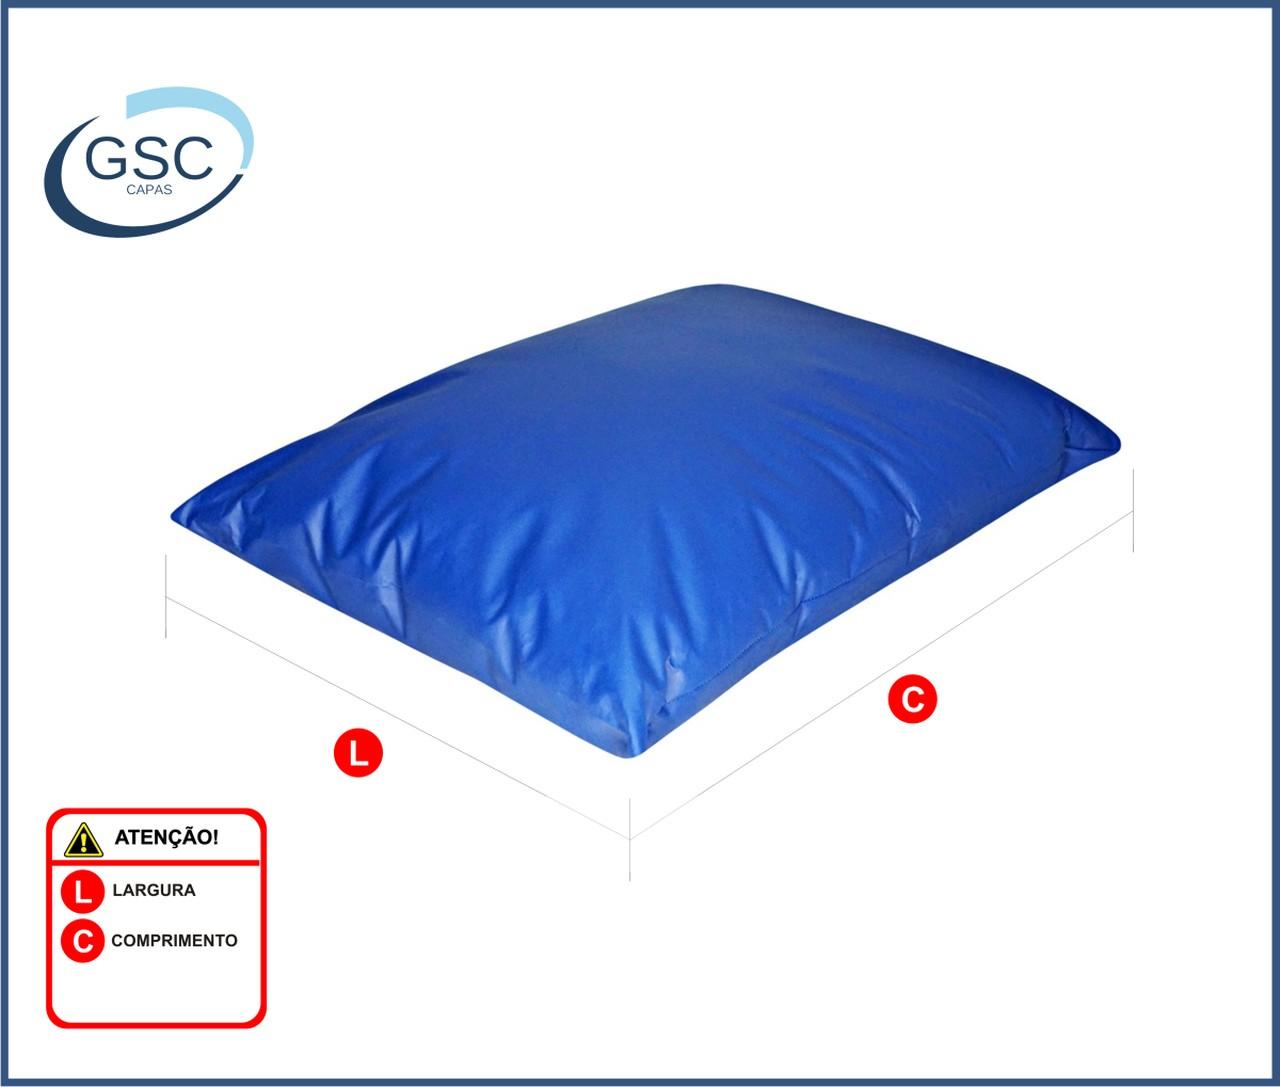 Capa Hospitalar Impermeável Soldada Travesseiro